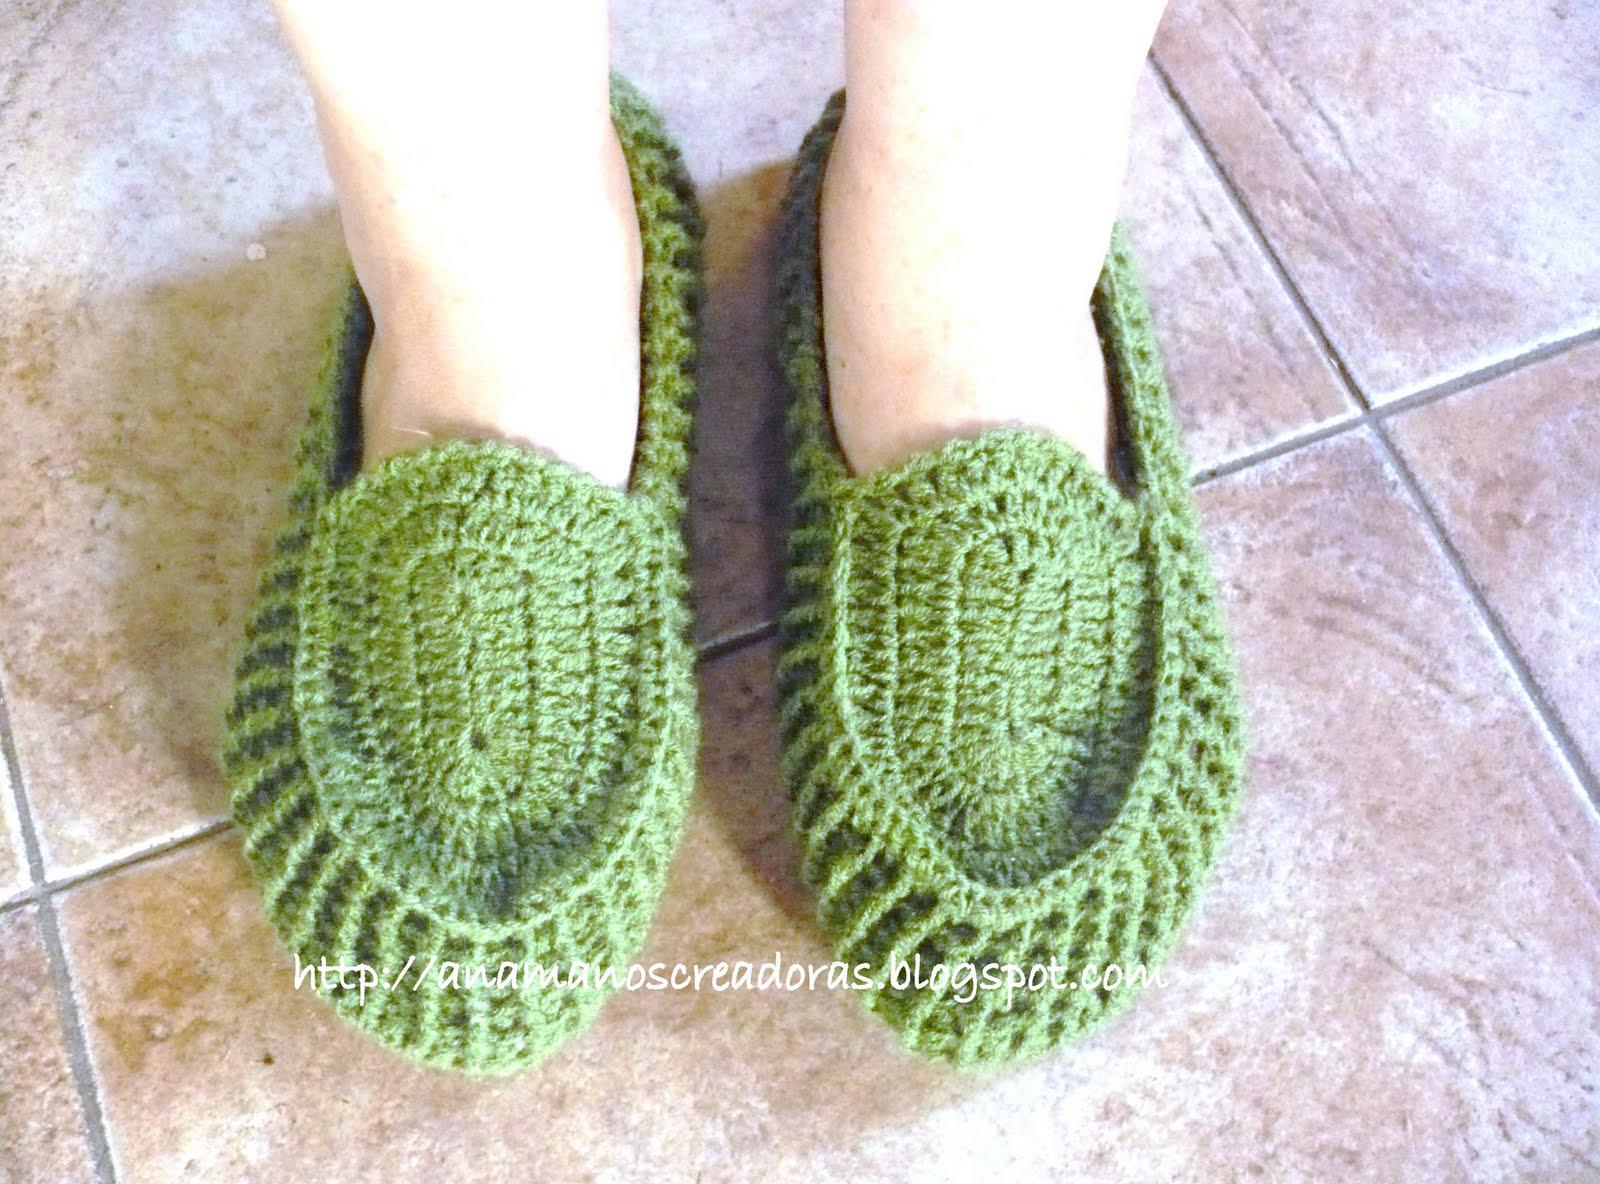 Tejidos, Zapatos and Google on Pinterest - El catálogo de